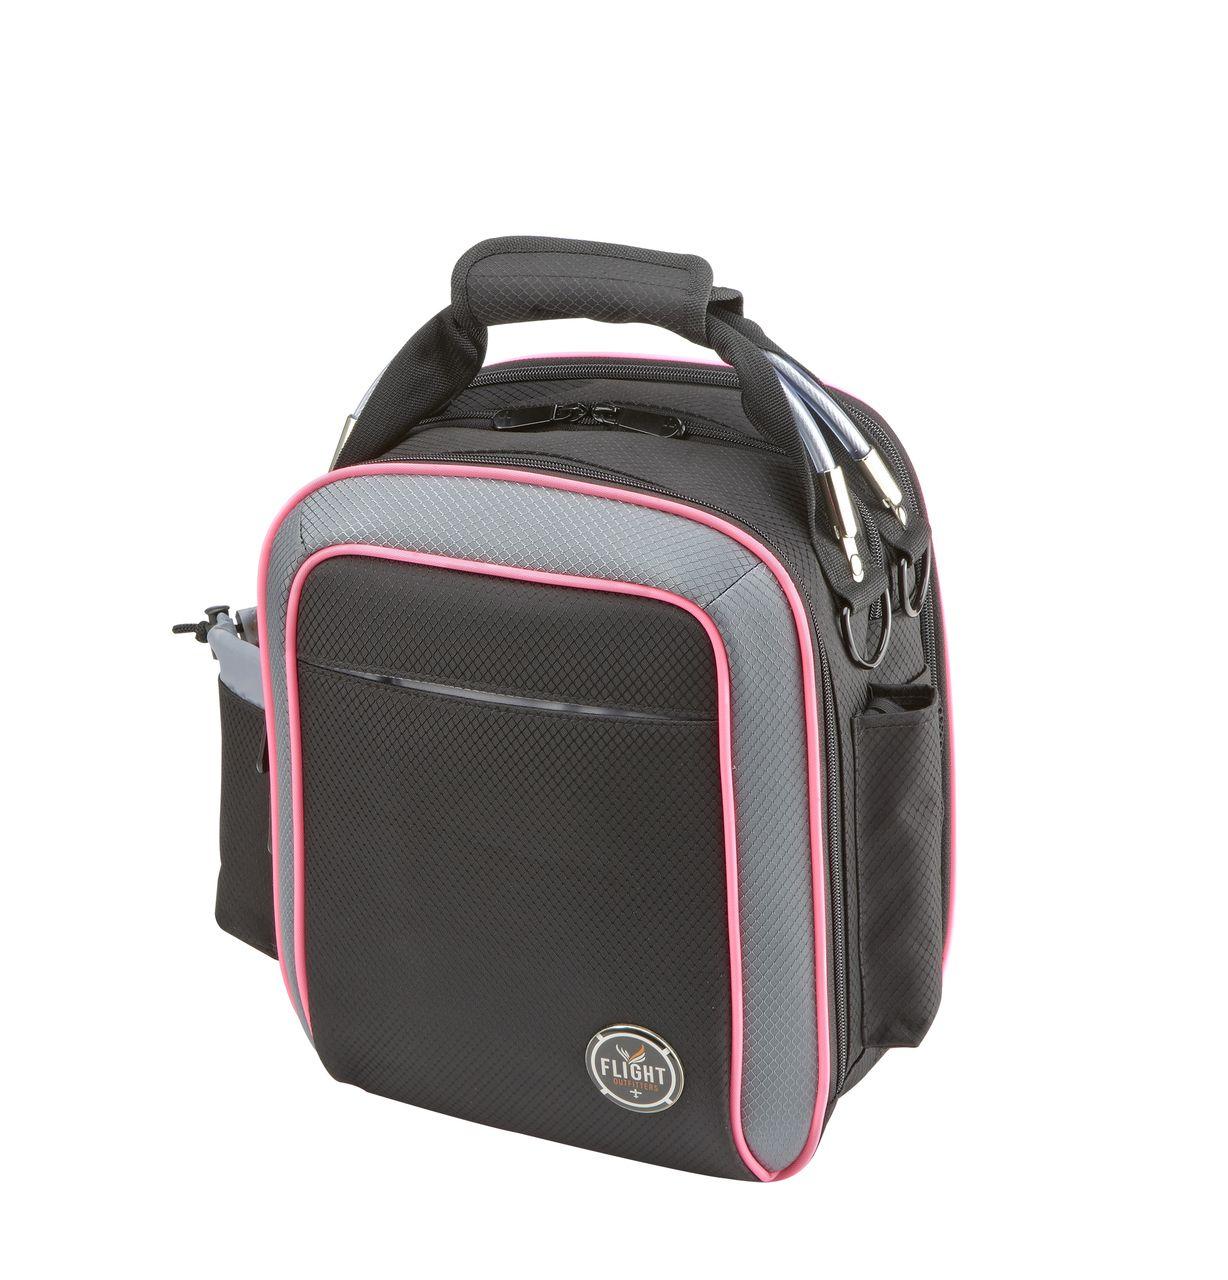 668a70a441 Fallon Aviation - Lift Headset Bag - Pink